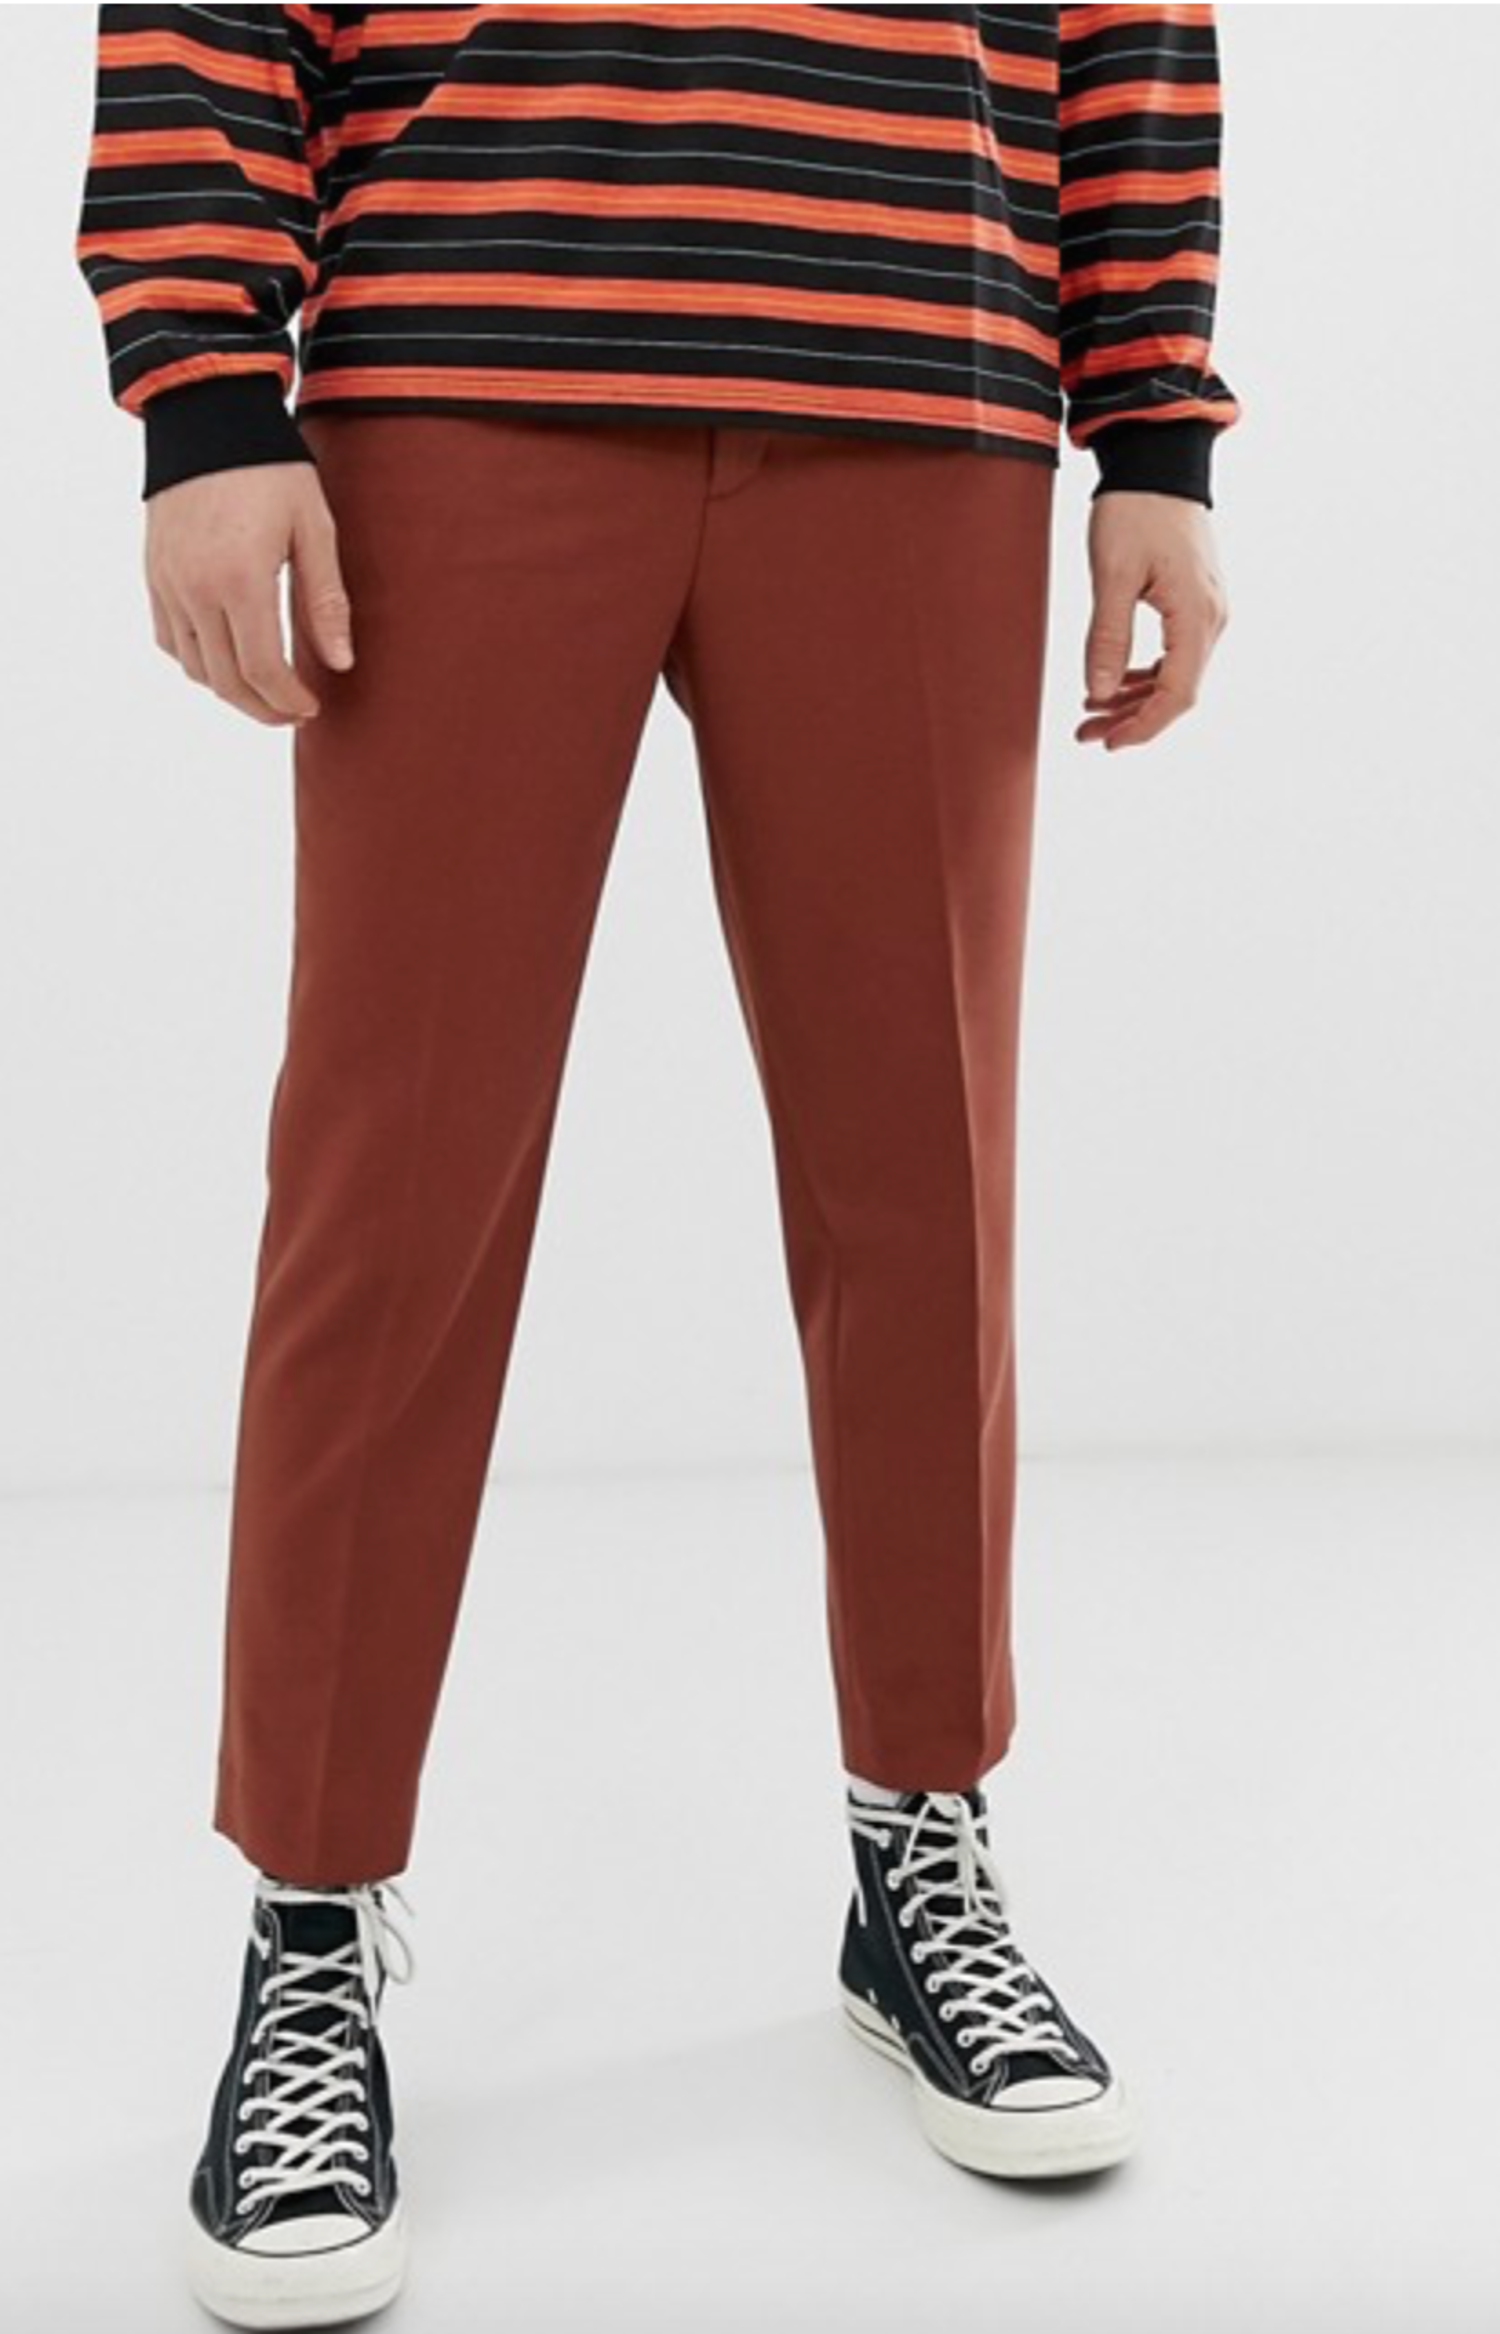 Pantalón color teja.